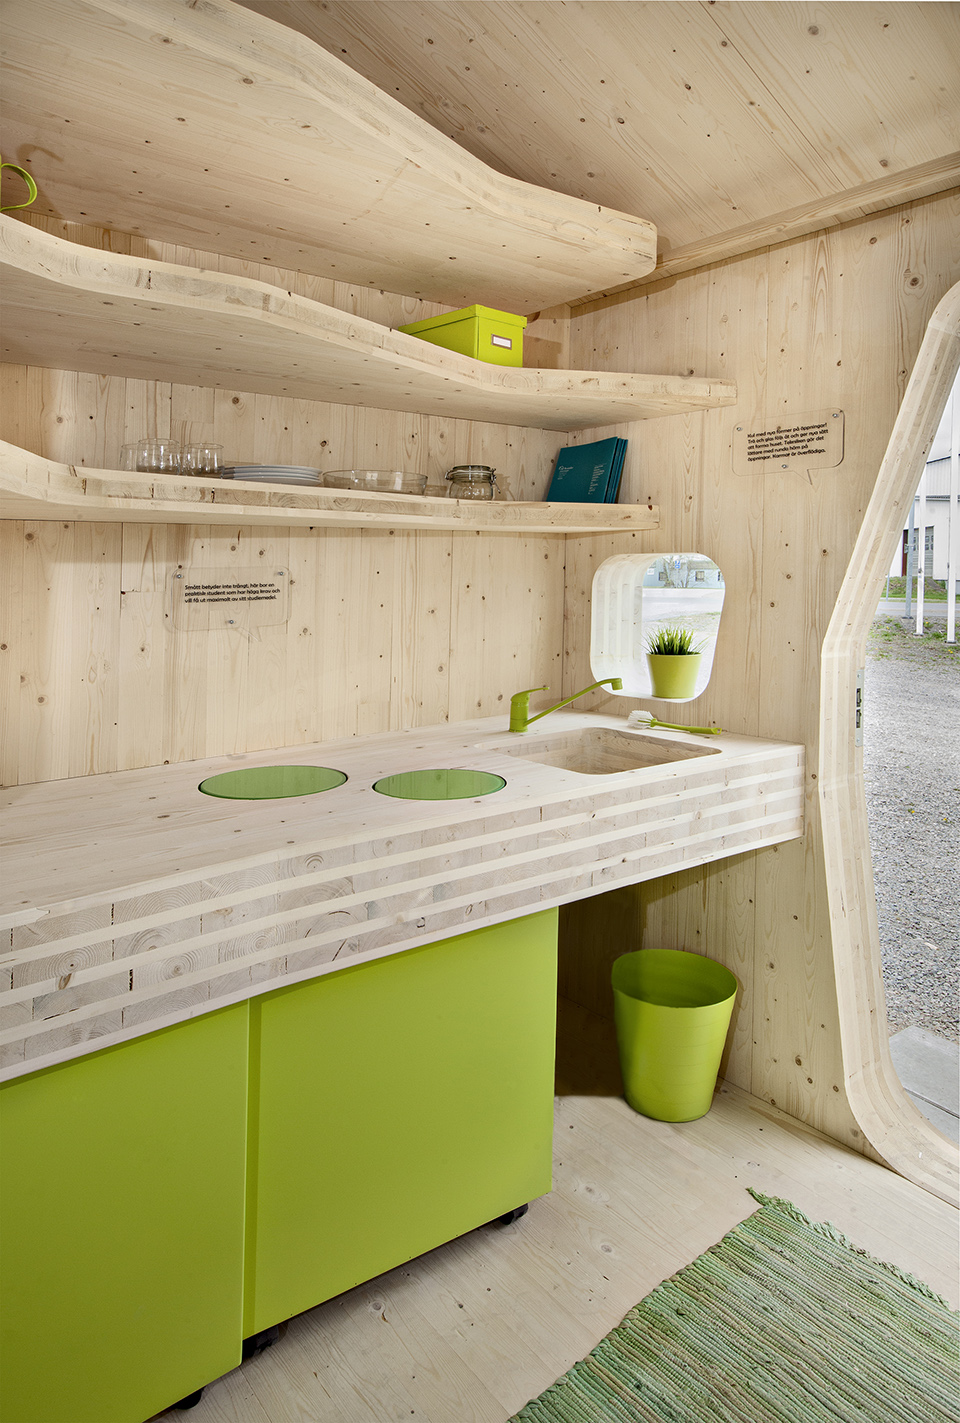 Prefab Student House by Tengbom Architects 8